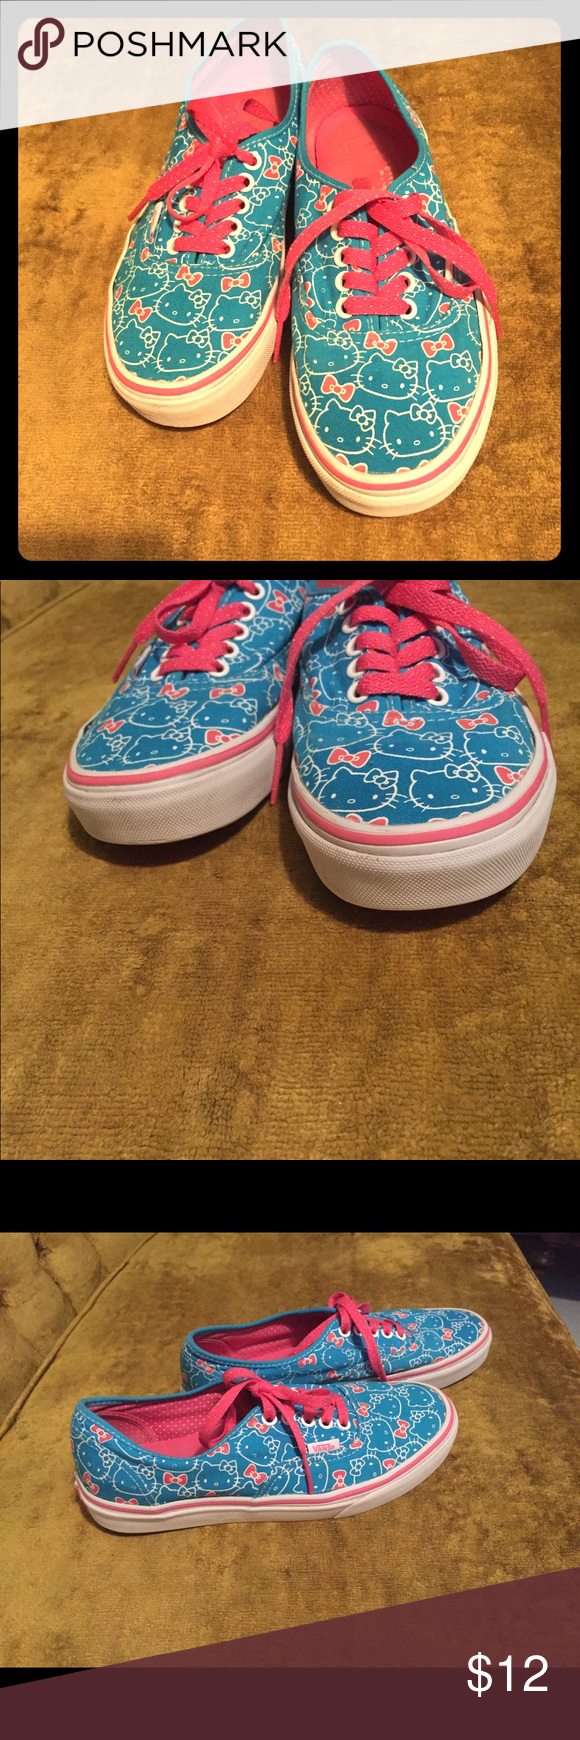 668ee31d12 Pinterest Pinterest Pinterest W8 M6 Sneakers 5 5 5 Pink Kitty Hello And Blue  Vans w14TqBT